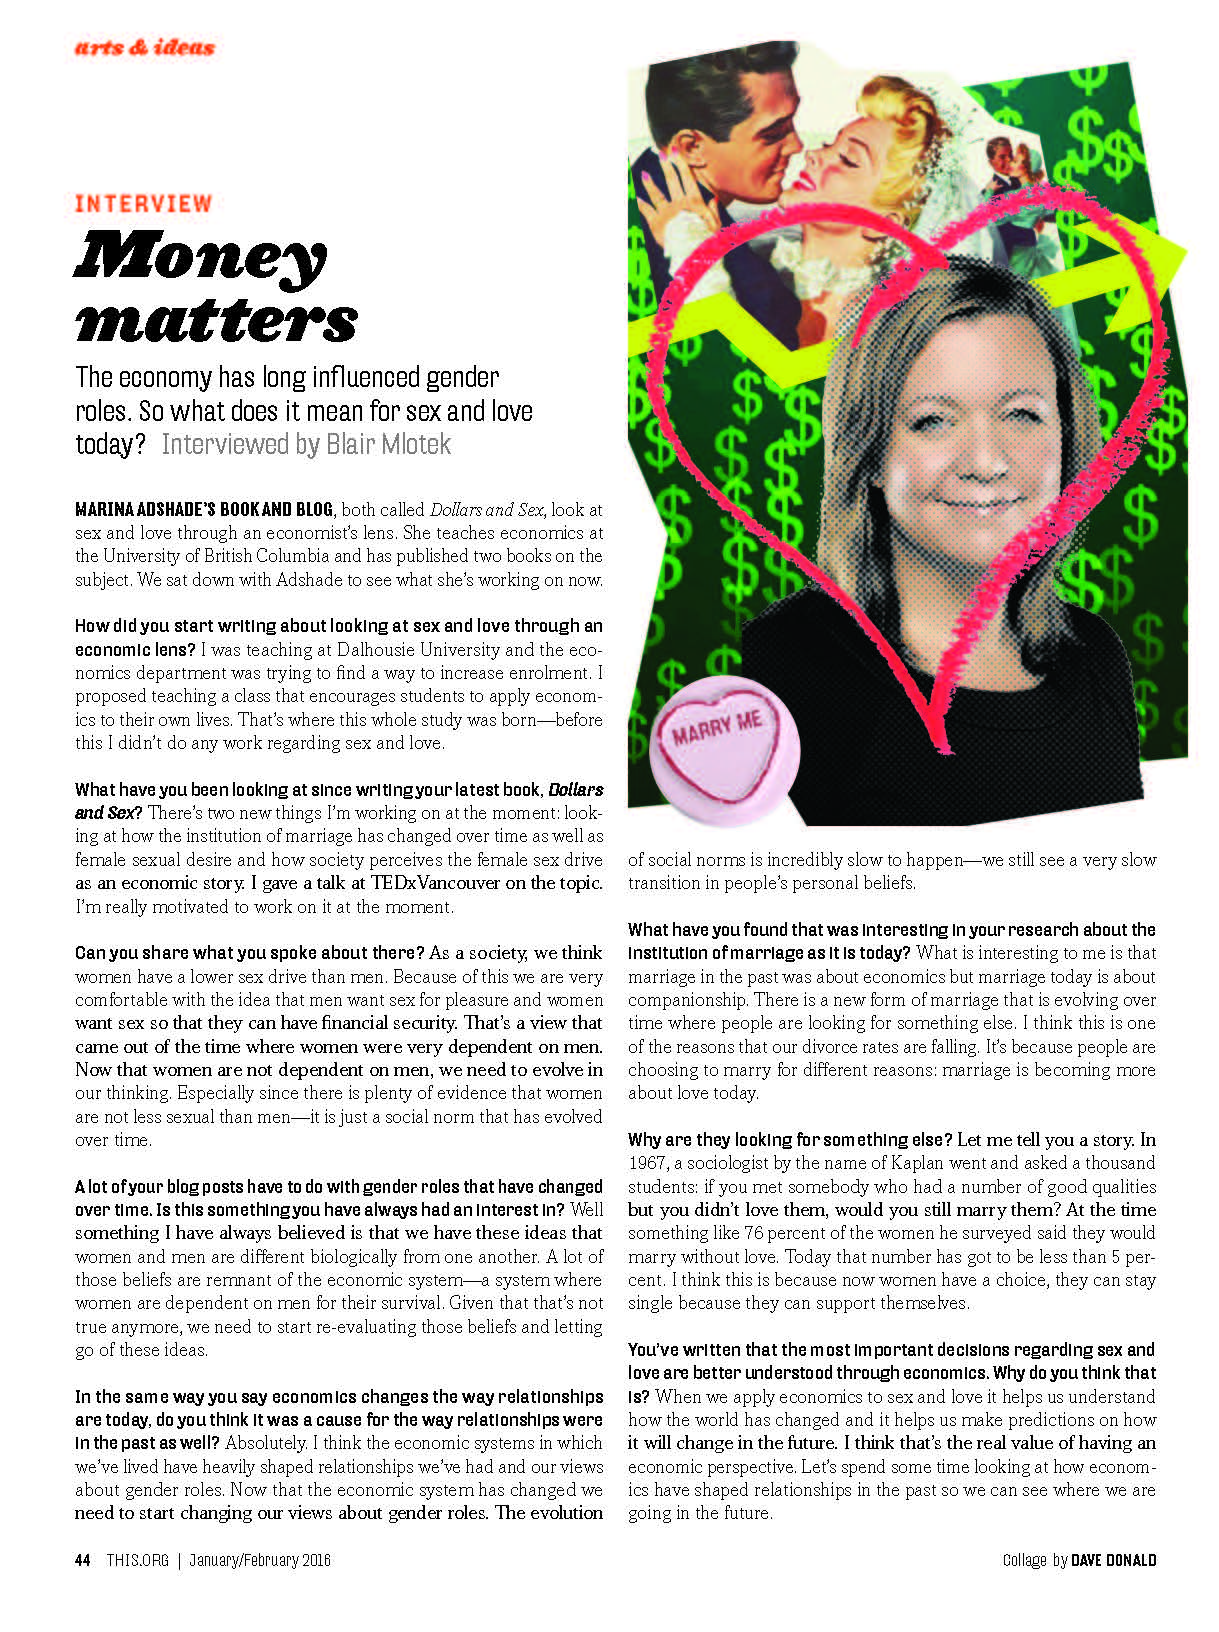 this magazine - Money Matters:In conversation with Marina Ashade